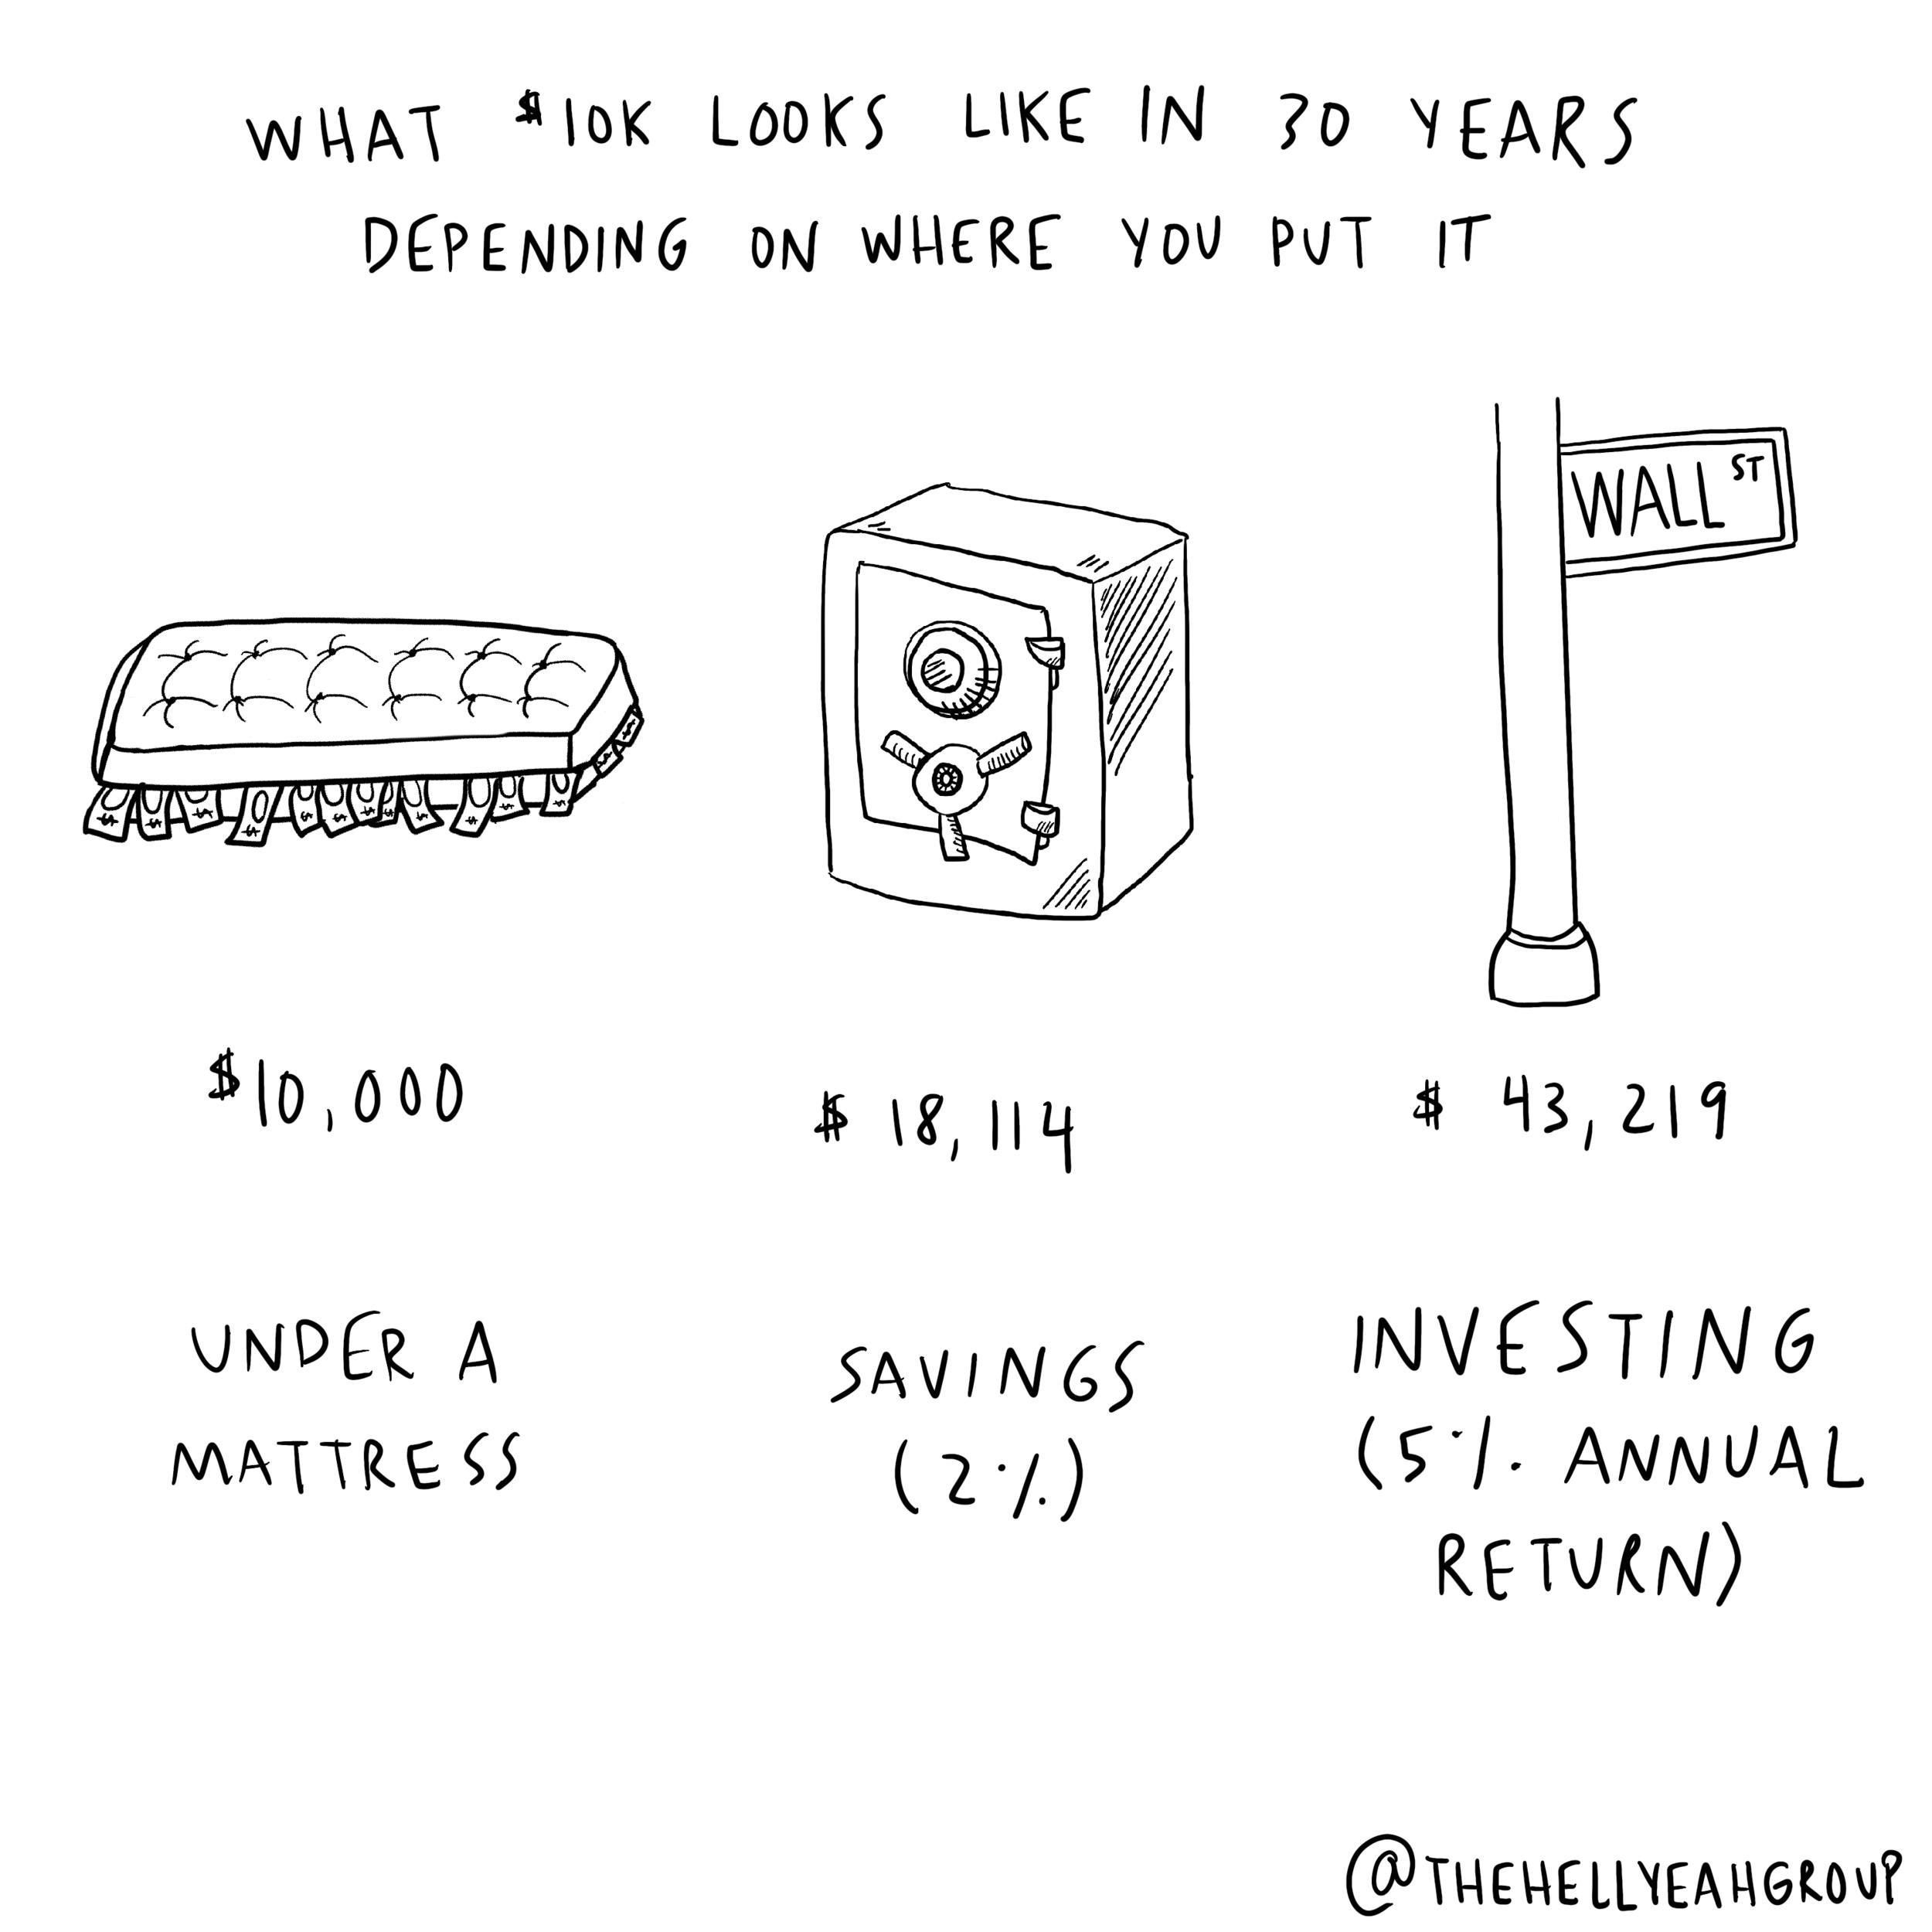 $10k under a mattress vs savings vs investing